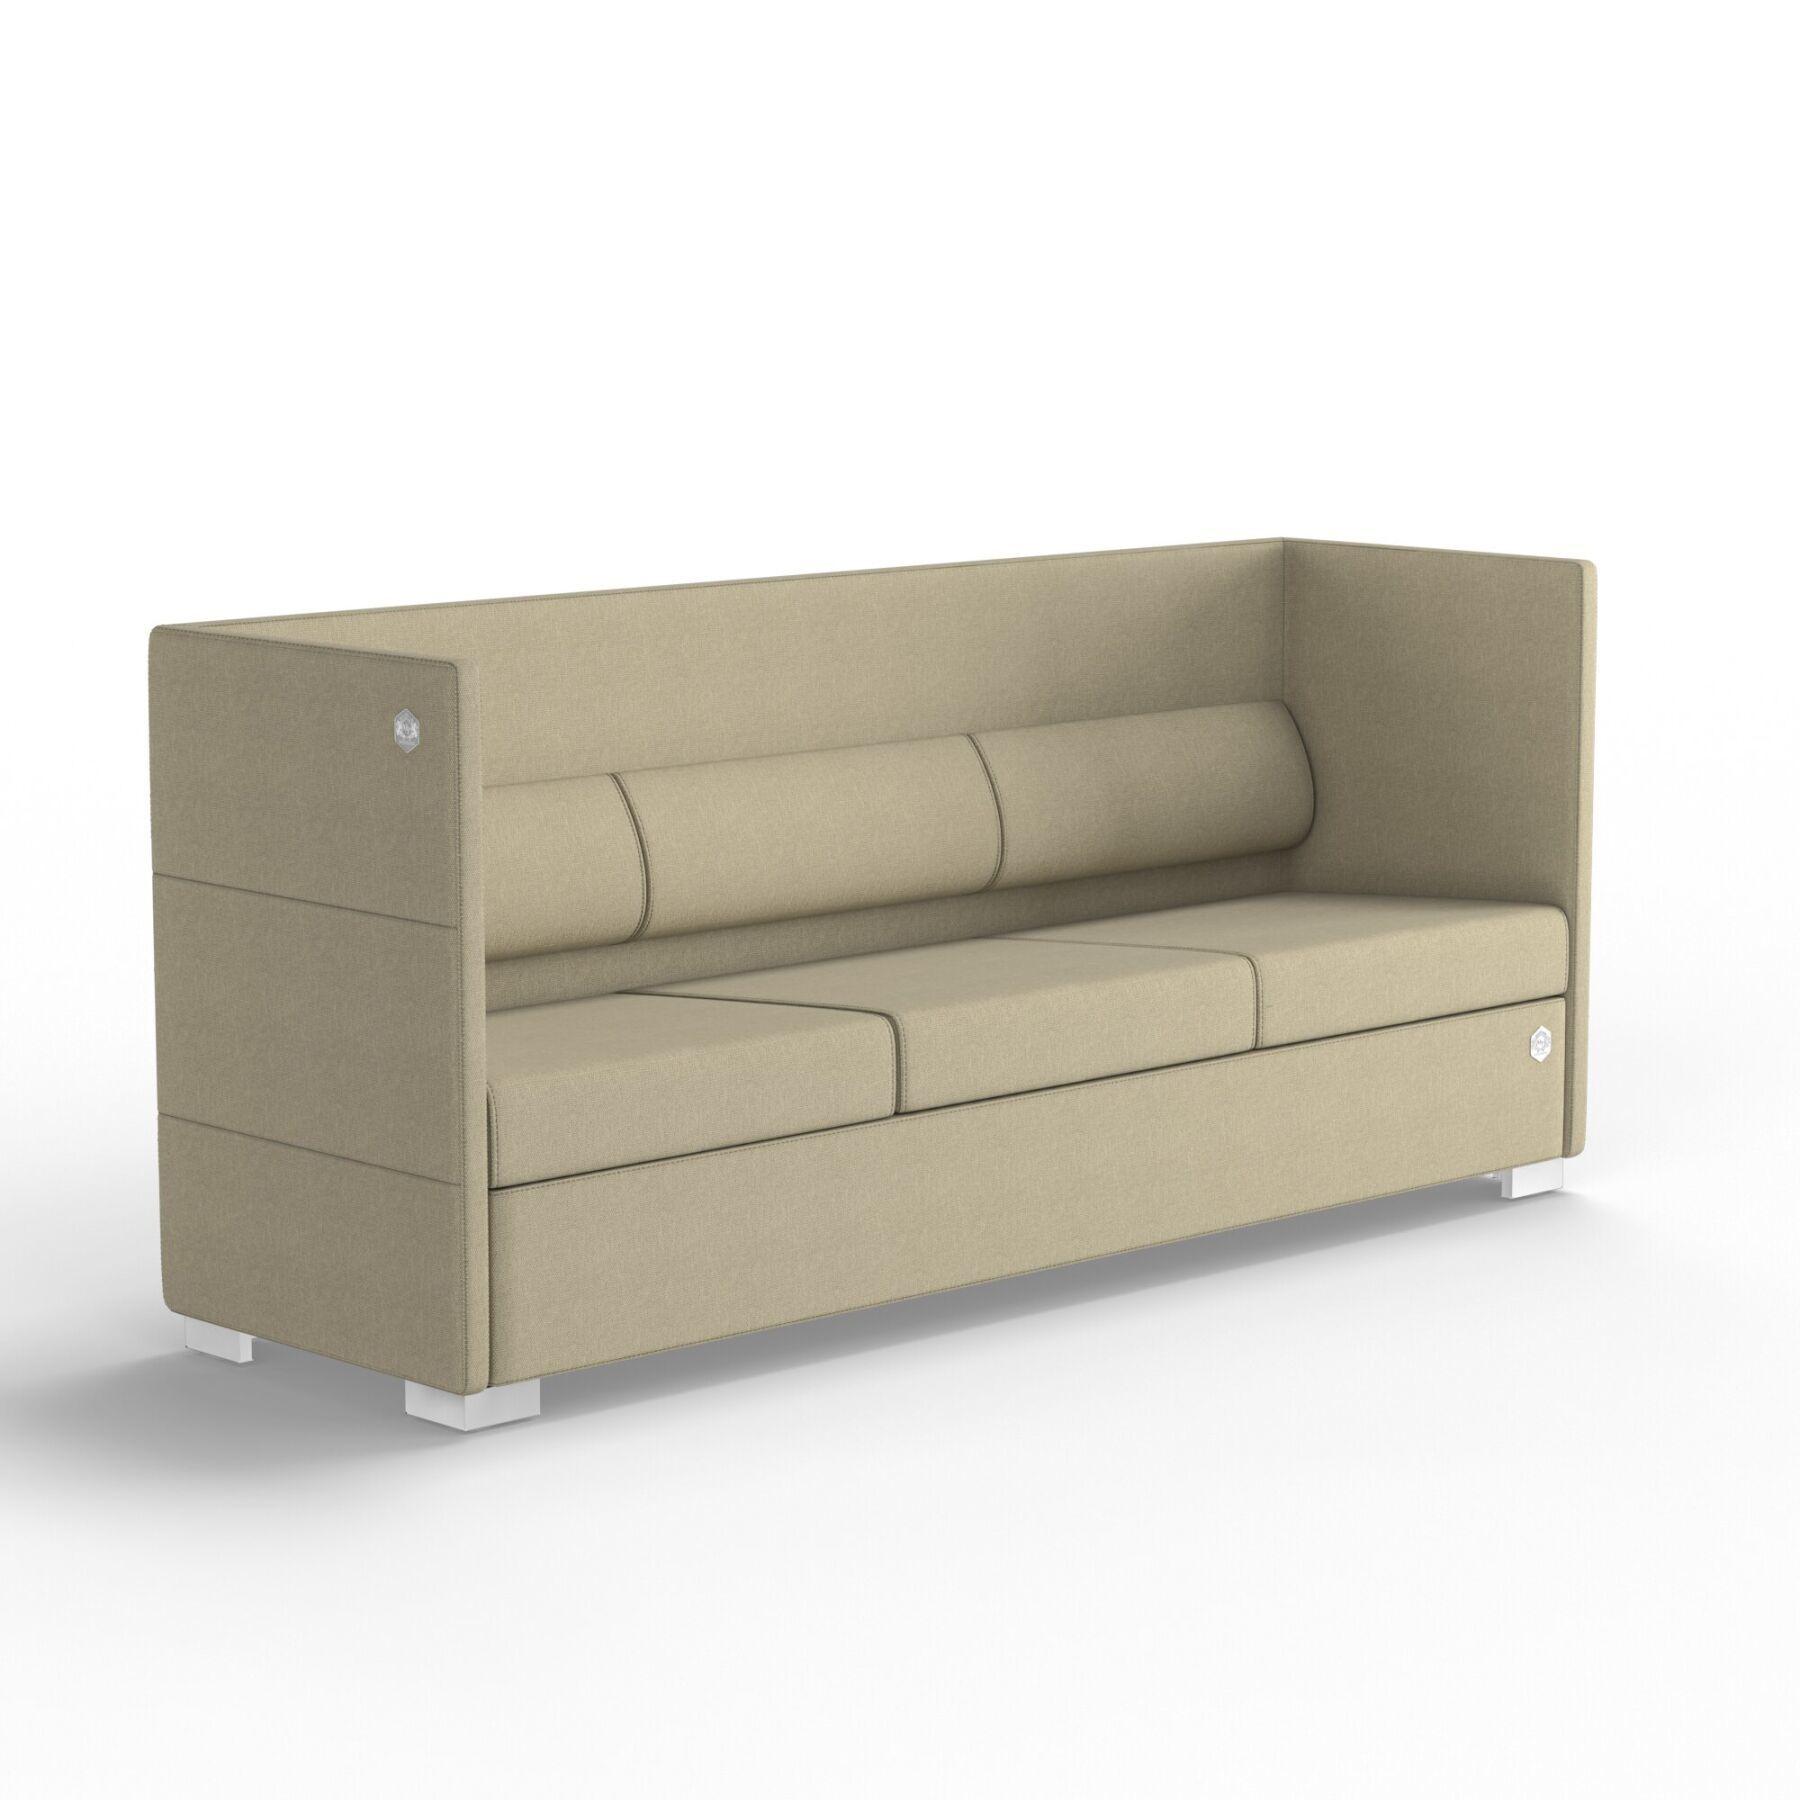 Трехместный диван KULIK SYSTEM CONFERENCE Ткань 3